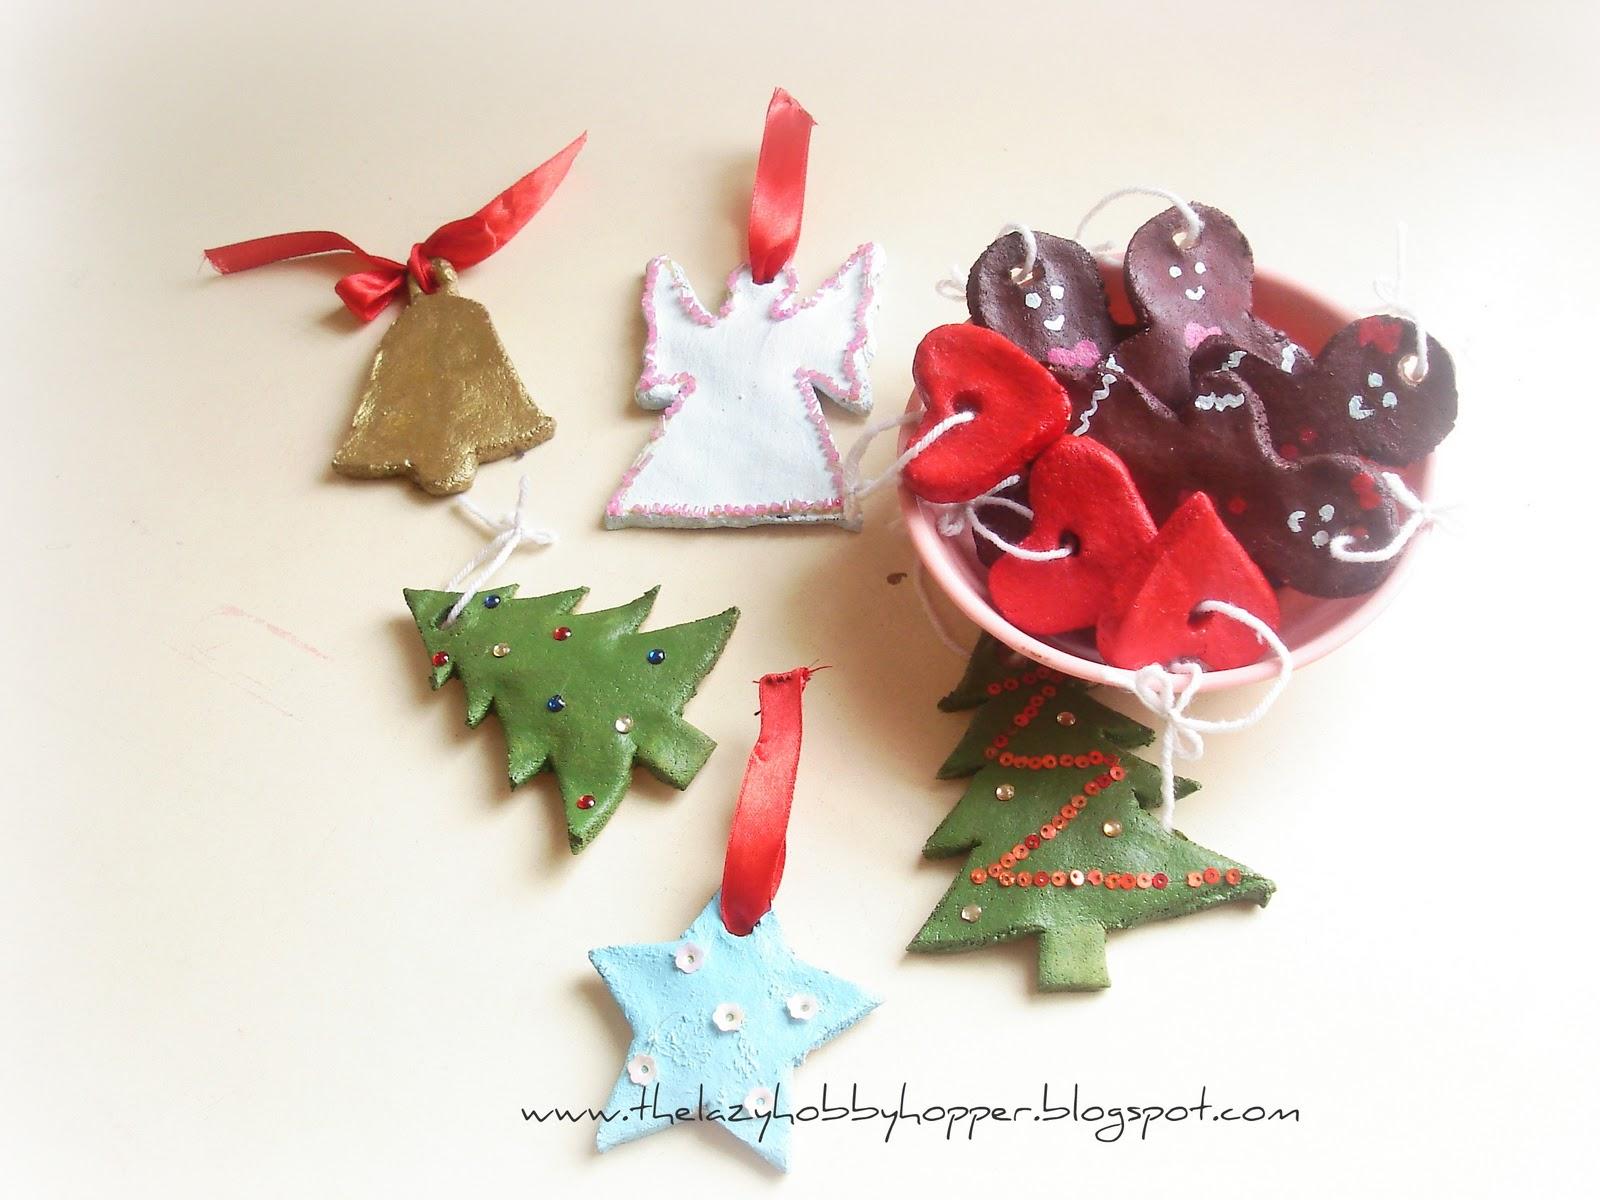 The Lazy Hobbyhopper: Salt dough Christmas ornaments